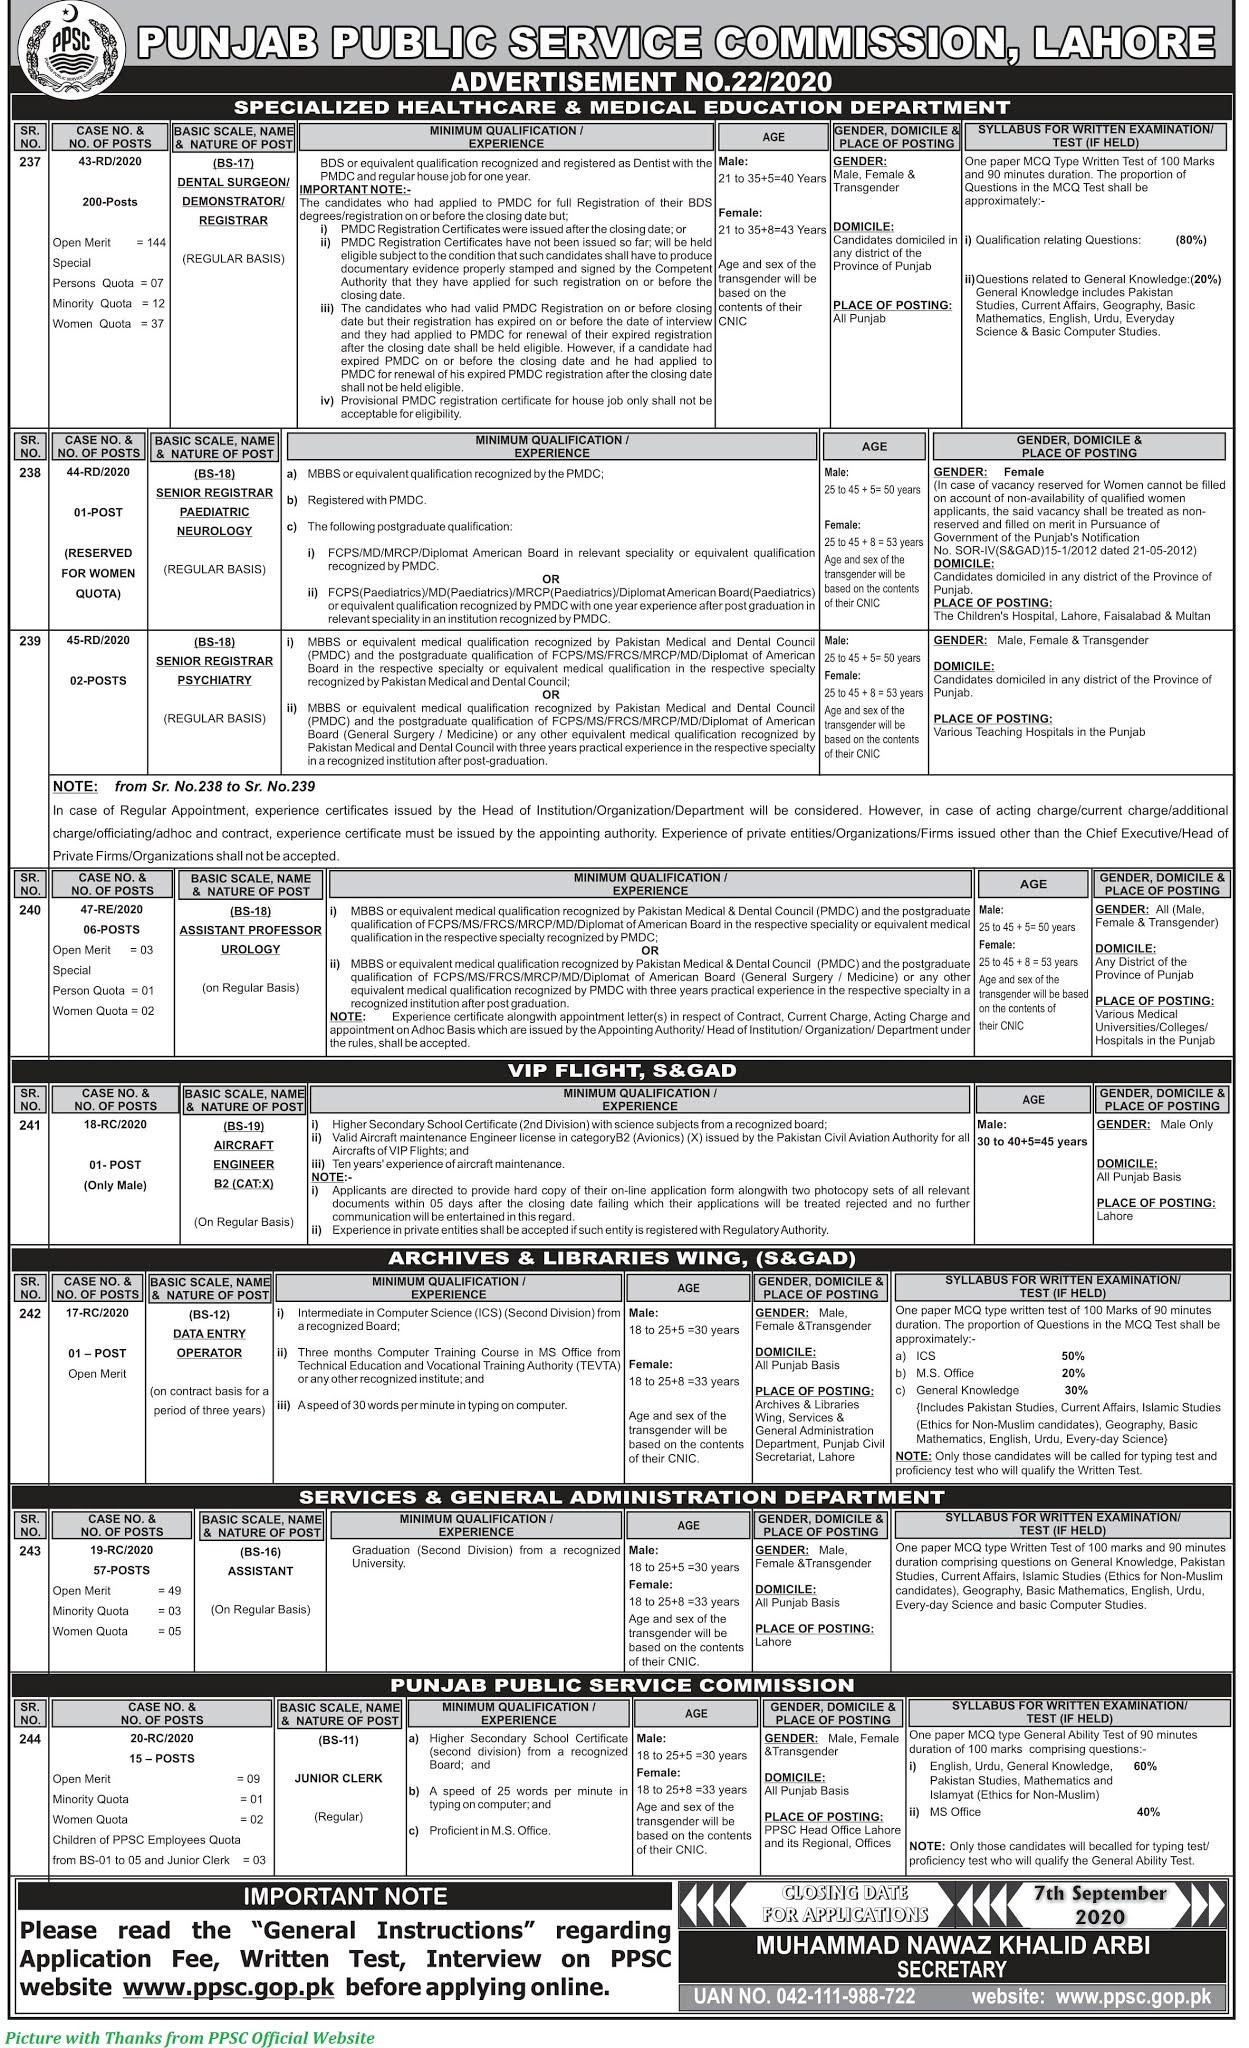 PPSC Jobs 2020 - Latest PPSC Jobs Advertisement No. 22/2020 PPSC August Jobs 2020 Apply Online